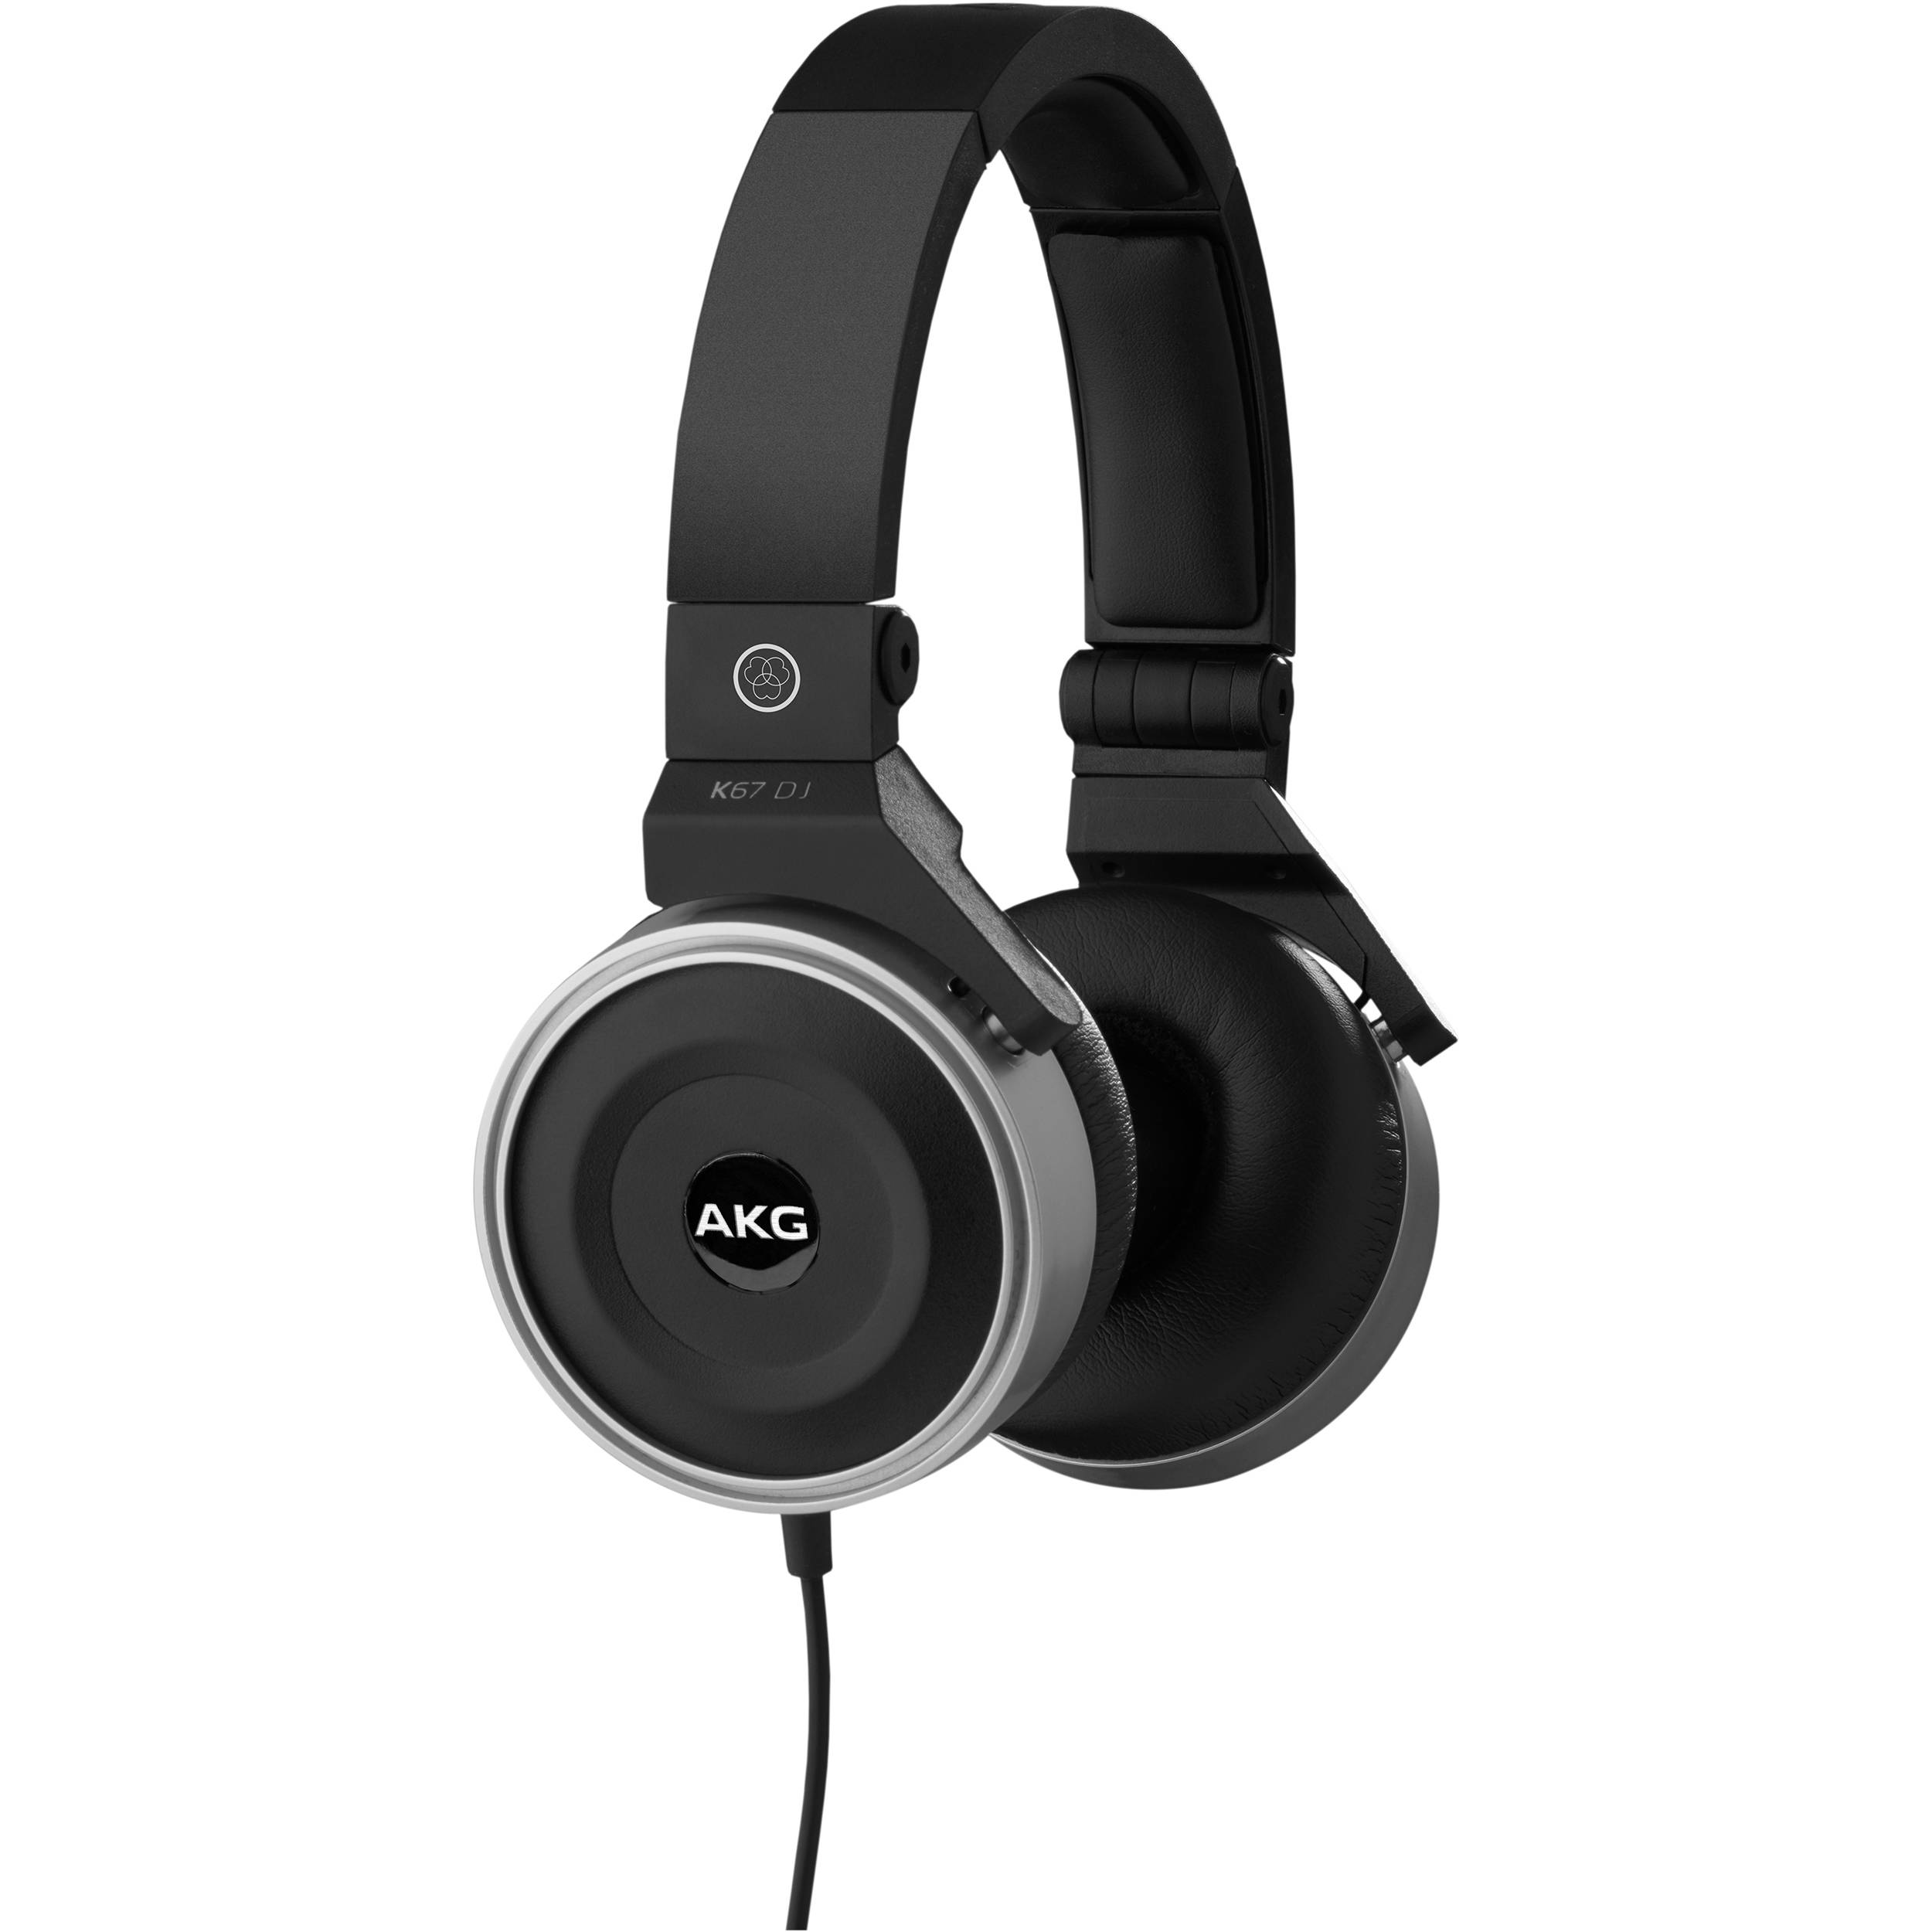 AKG K67 High-Performance DJ Headphones 3283H00020 B&H Photo